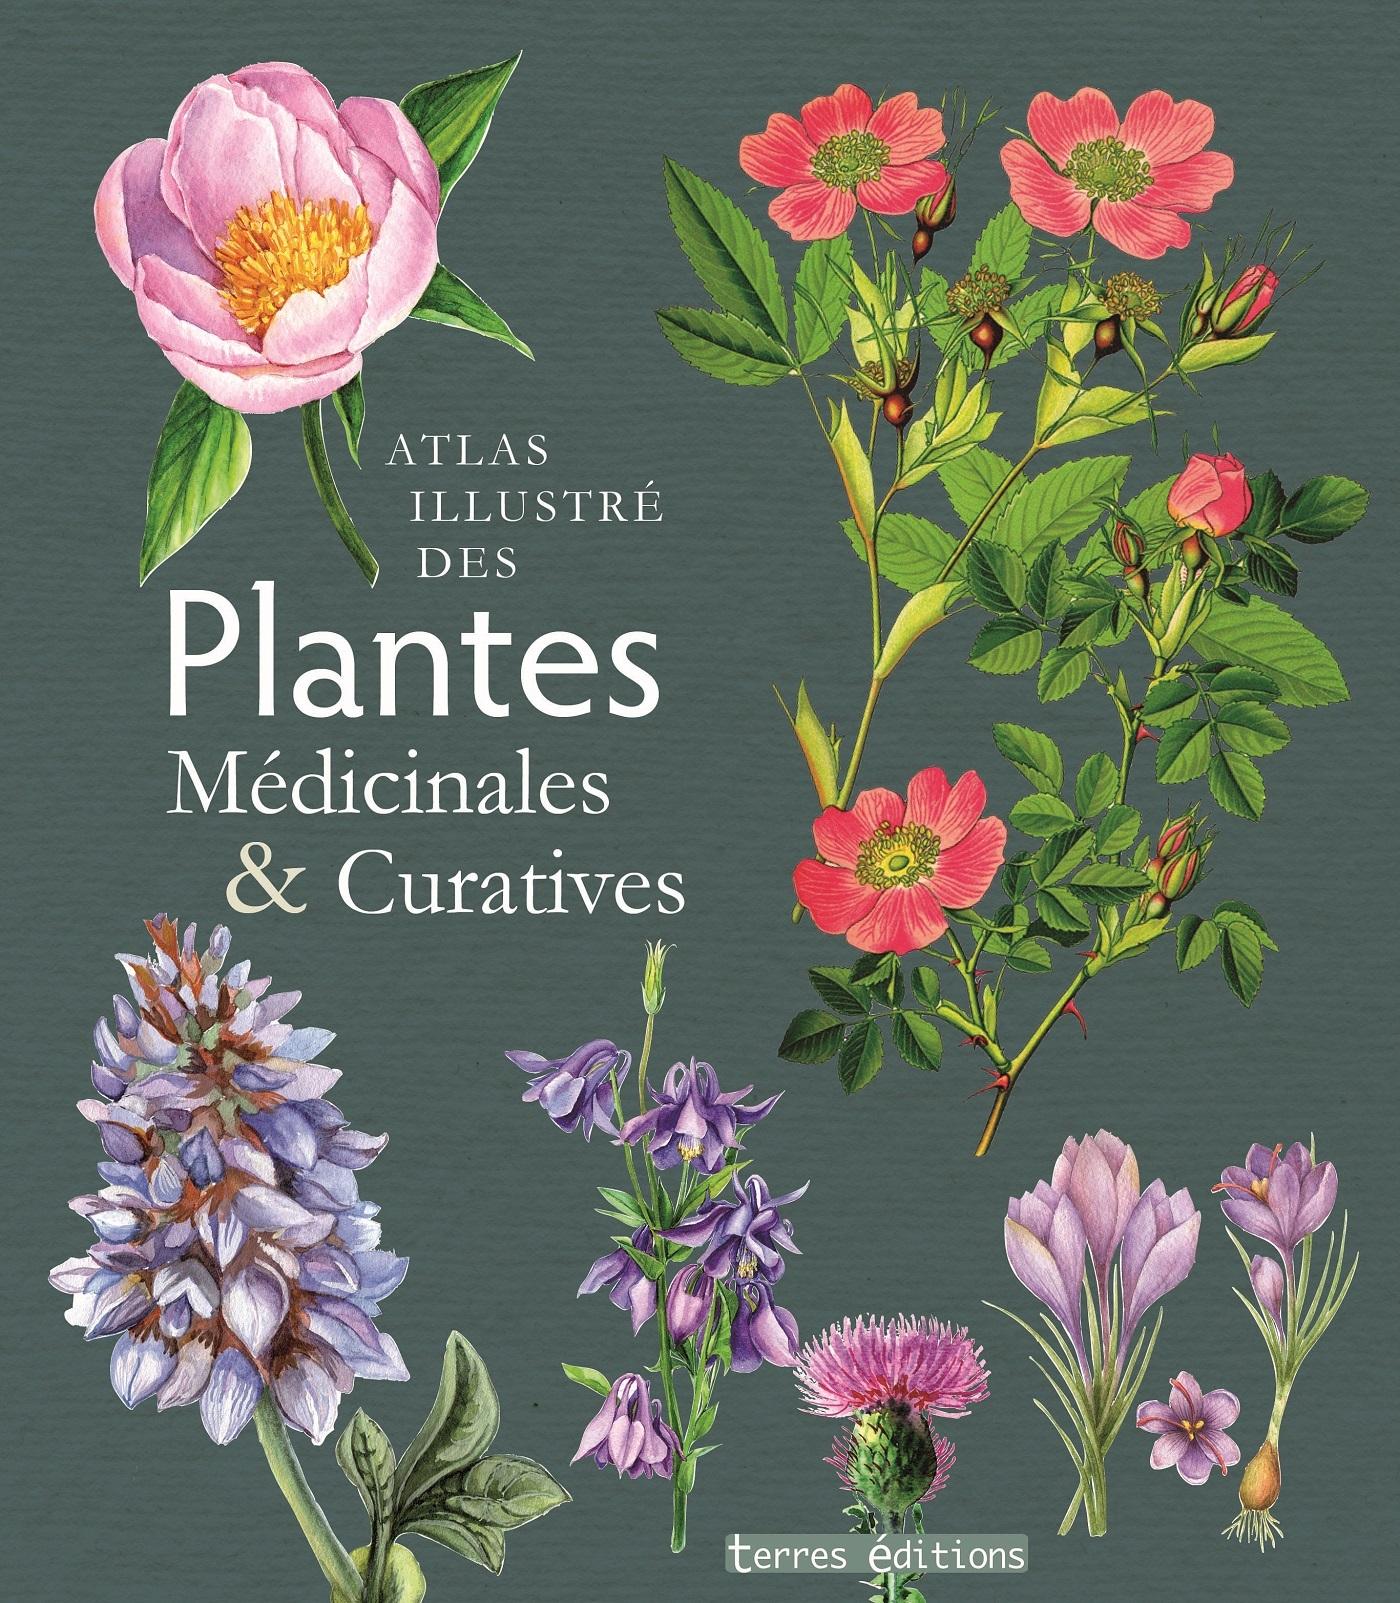 ATLAS ILLUSTRE DES PLANTES MEDICINALES ET CURATIVES